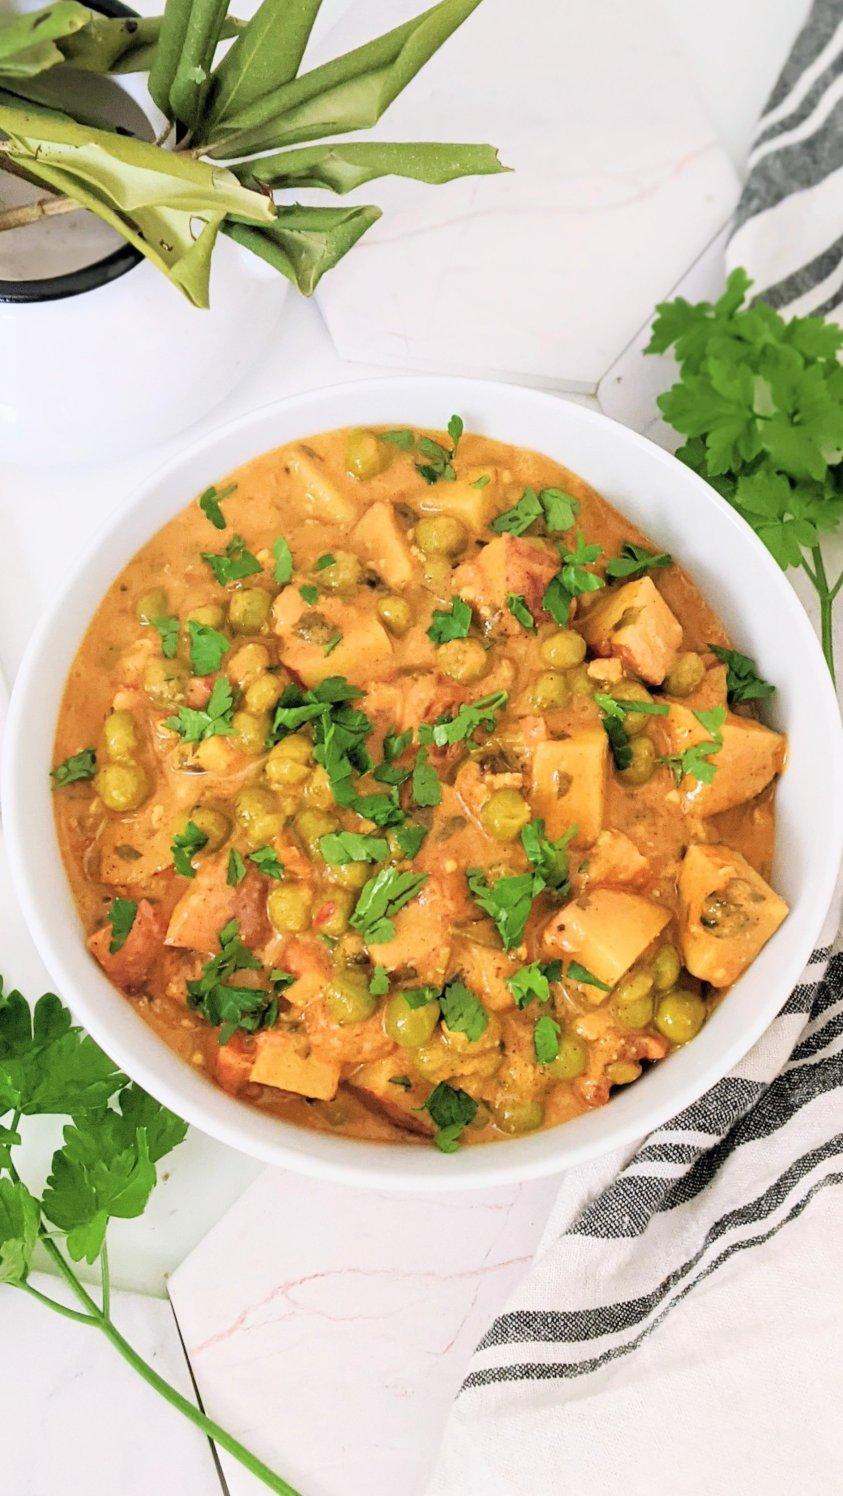 vegetarian aloo matar with coconut milk recipe creamy potato pea curry recipe healthy vegetarian vegan gluten free indian dinner curry recipes